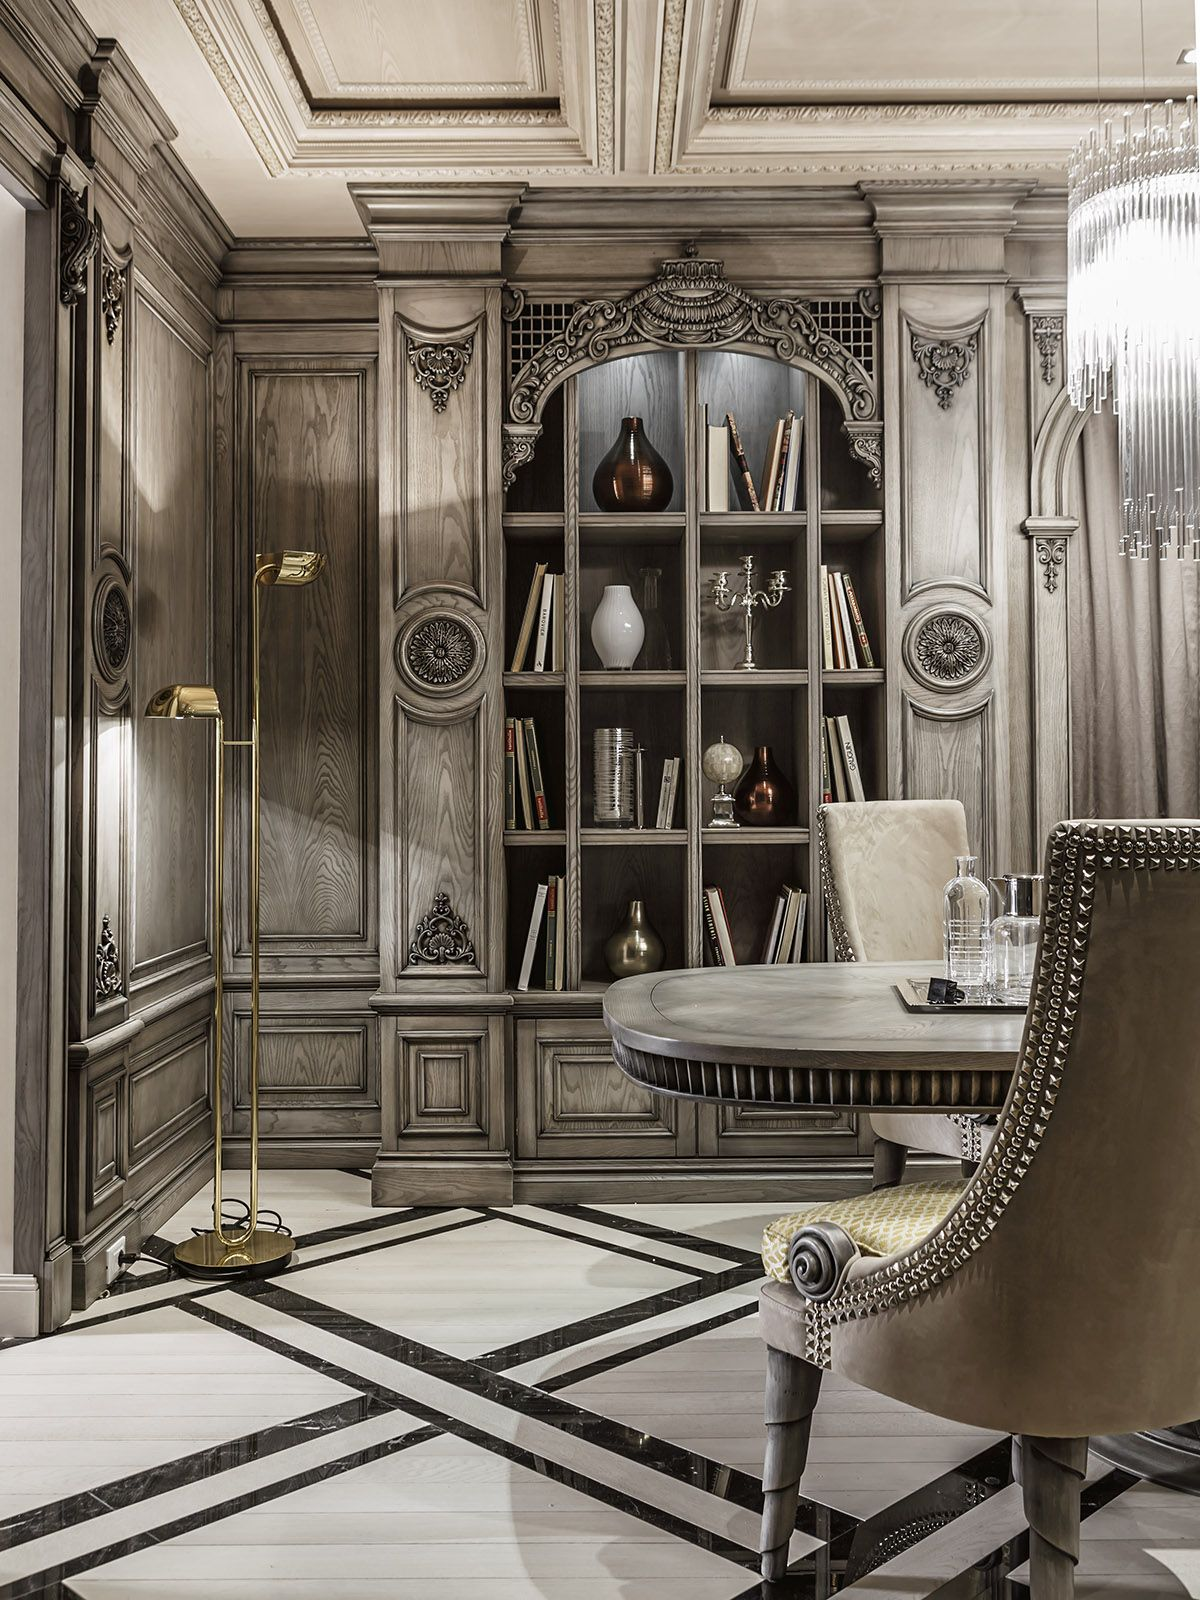 Bruno Tarsia Architect And Interior Stylist Produces Editorial